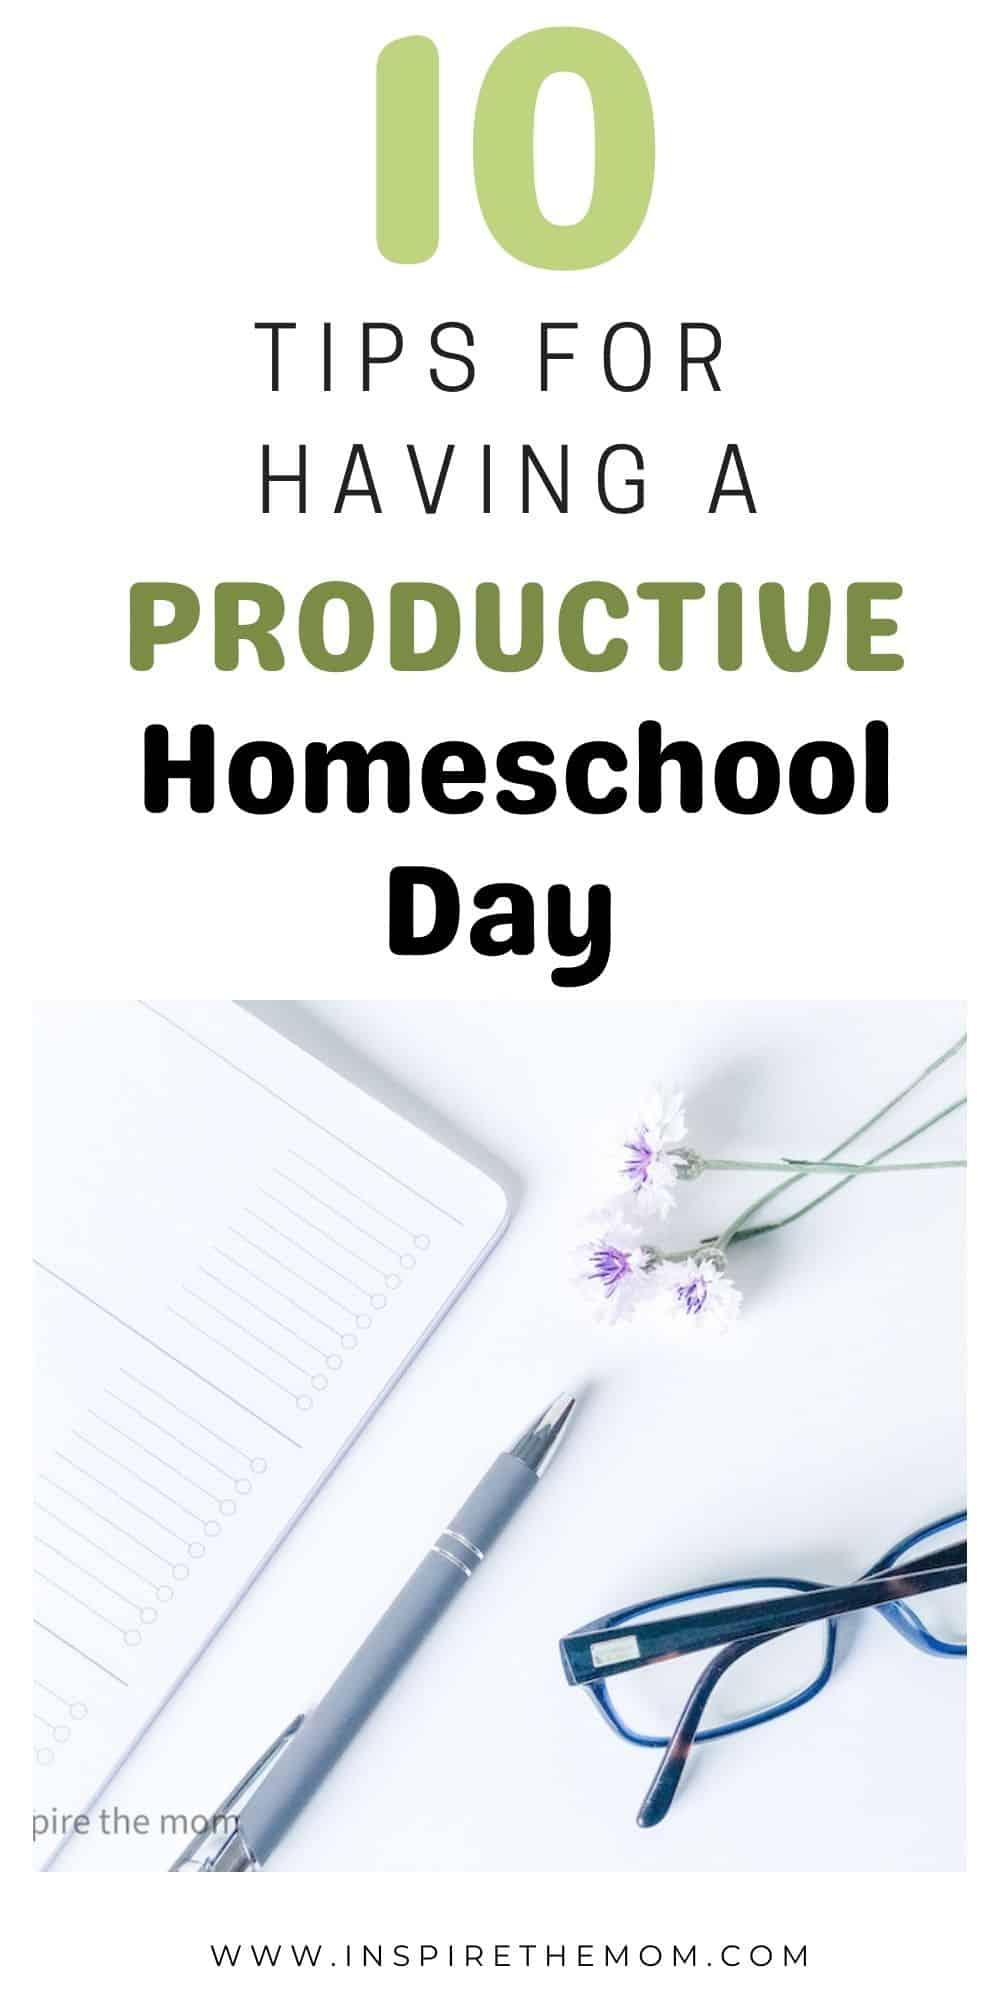 ten tips for having a productive homeschool day pin